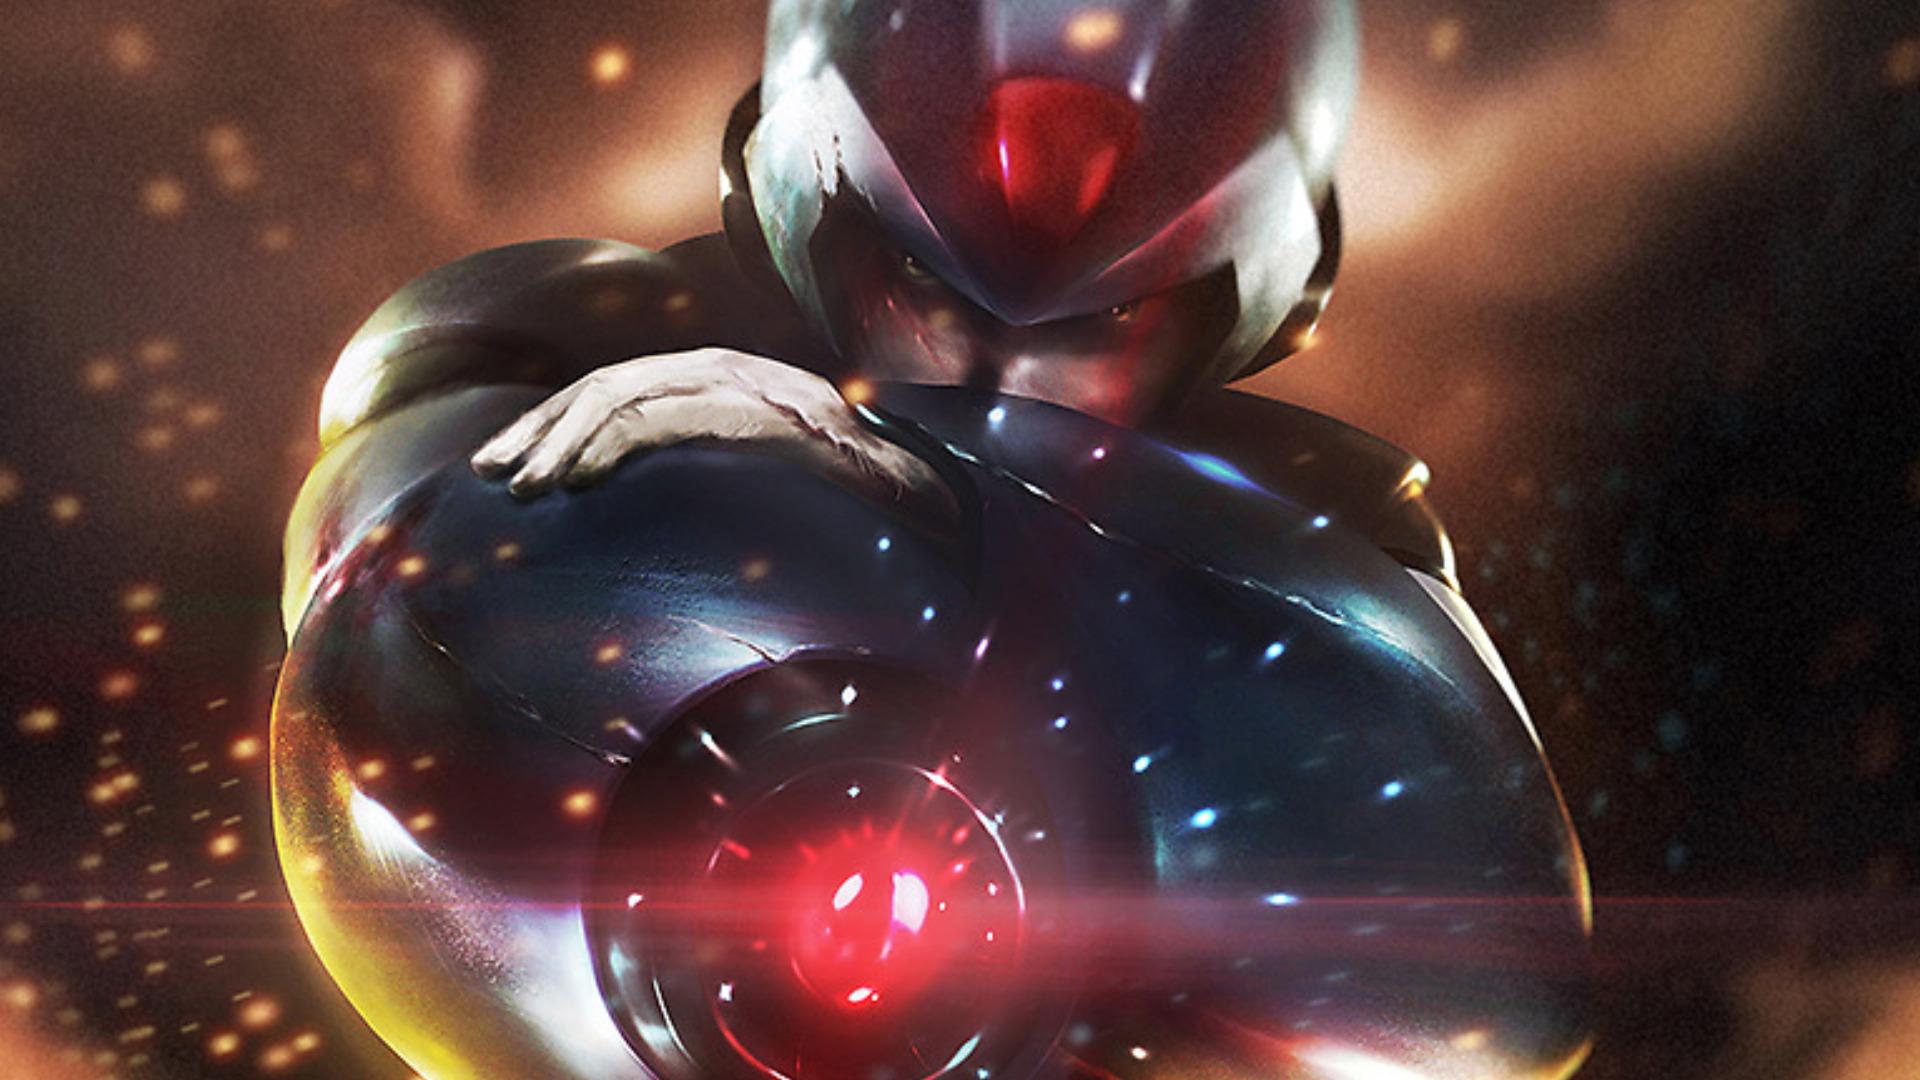 Megaman images X vs Zero HD wallpaper and background photos (9487607)